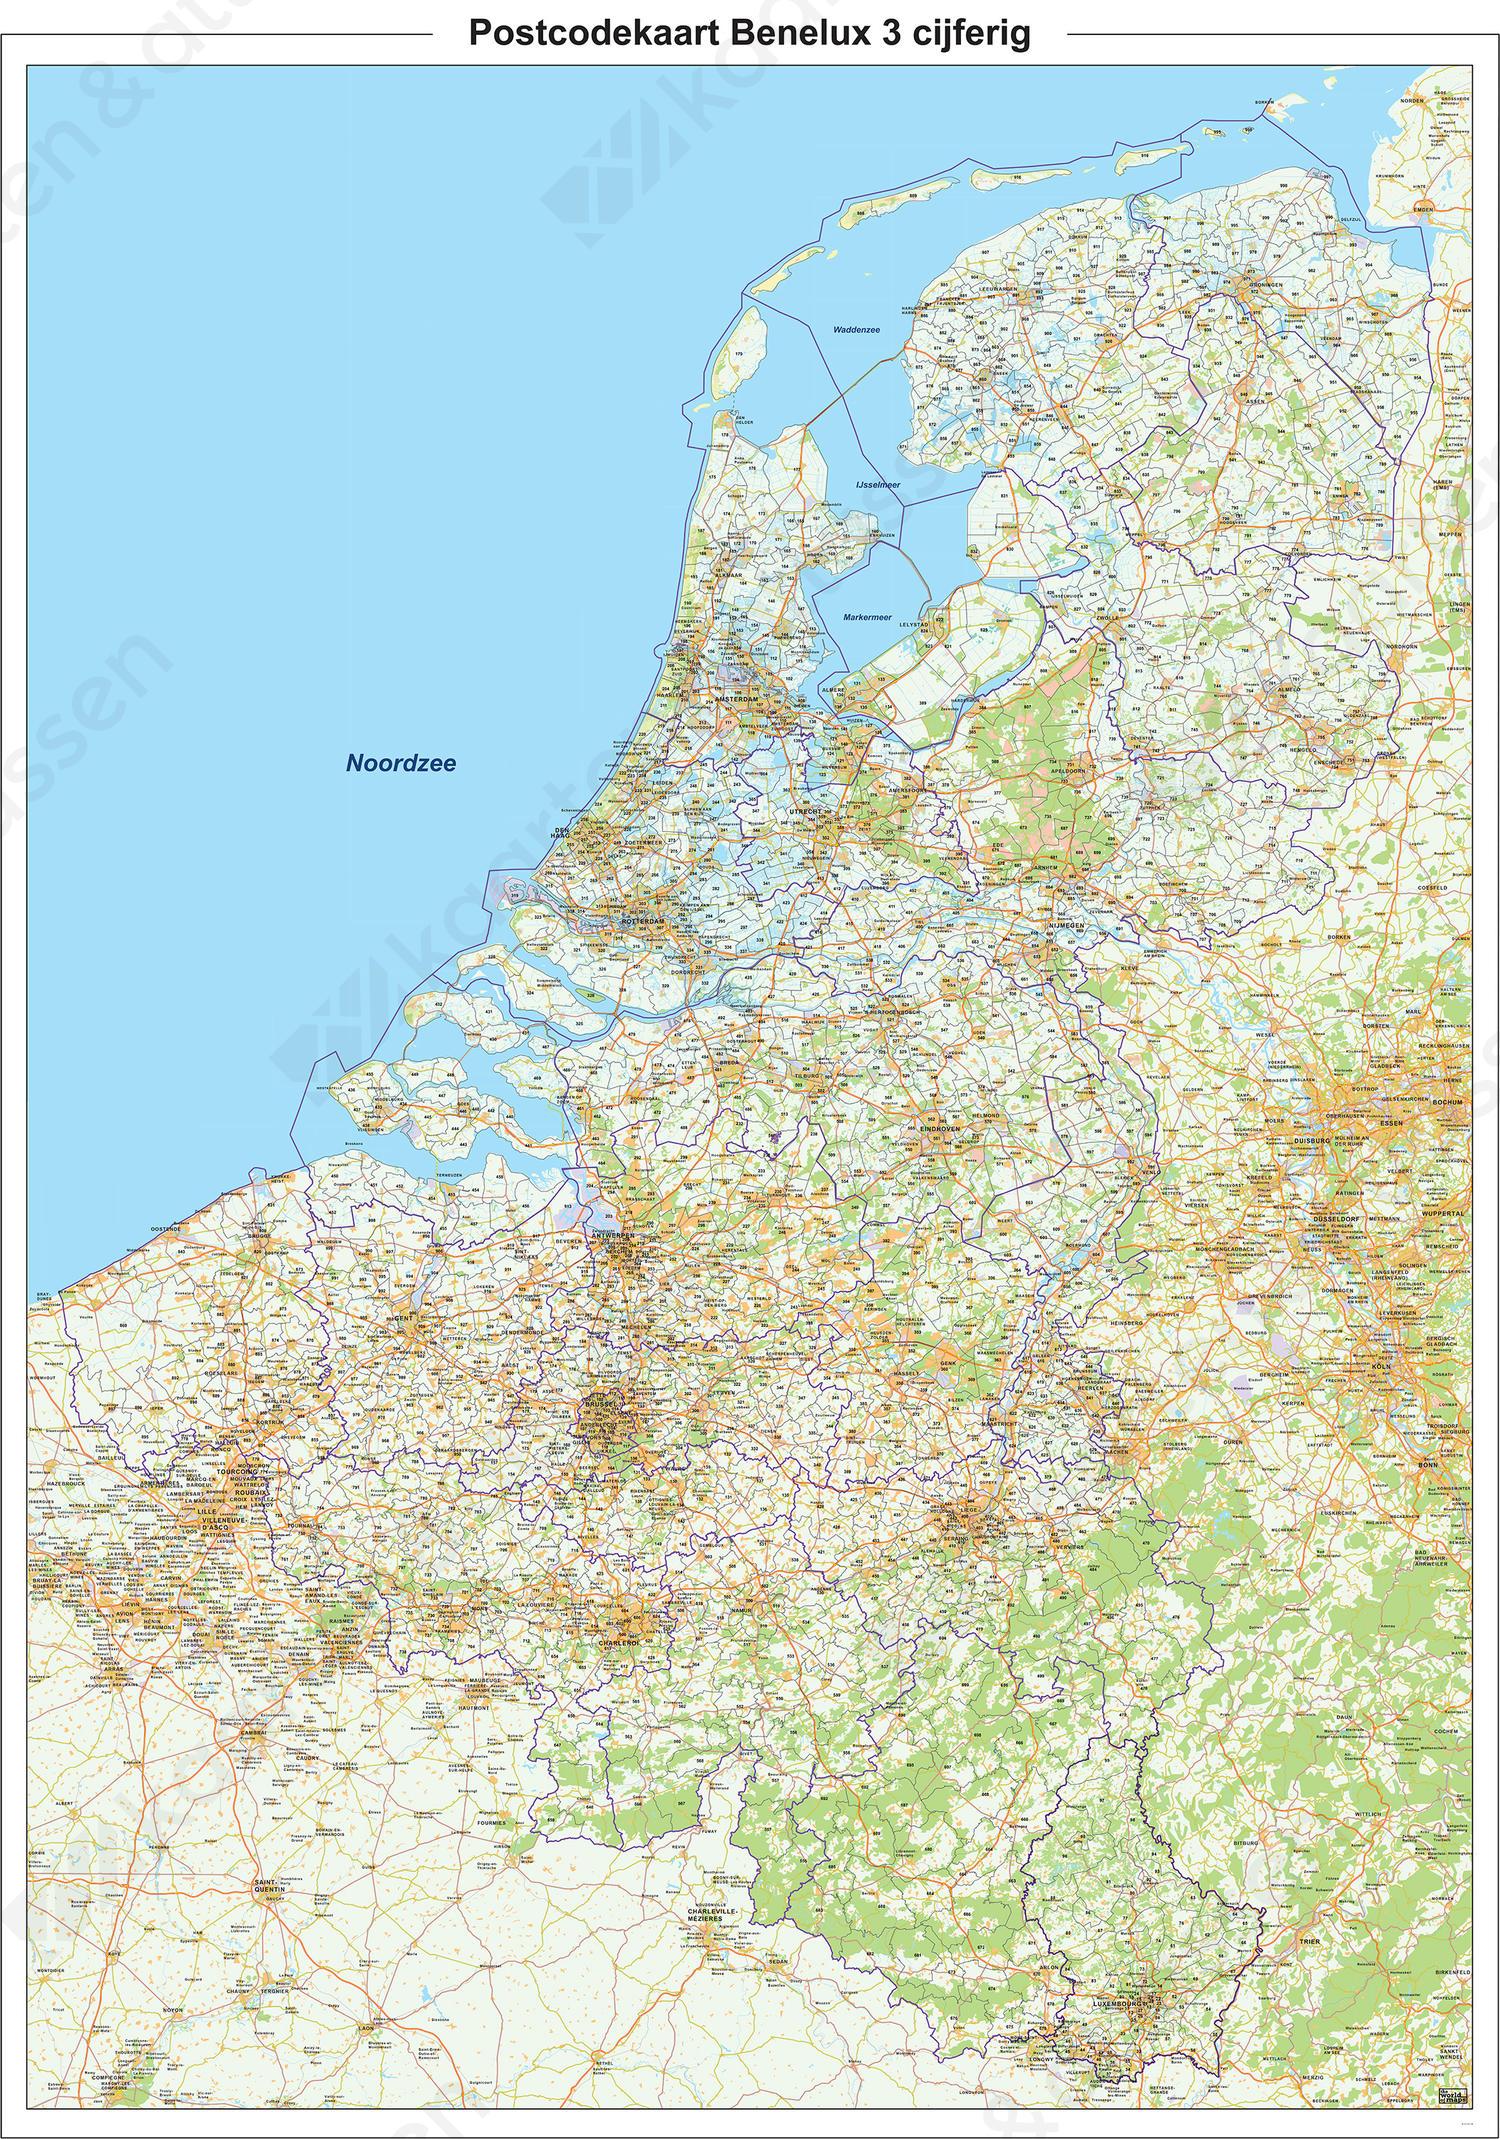 Digitale Postcodekaart Benelux